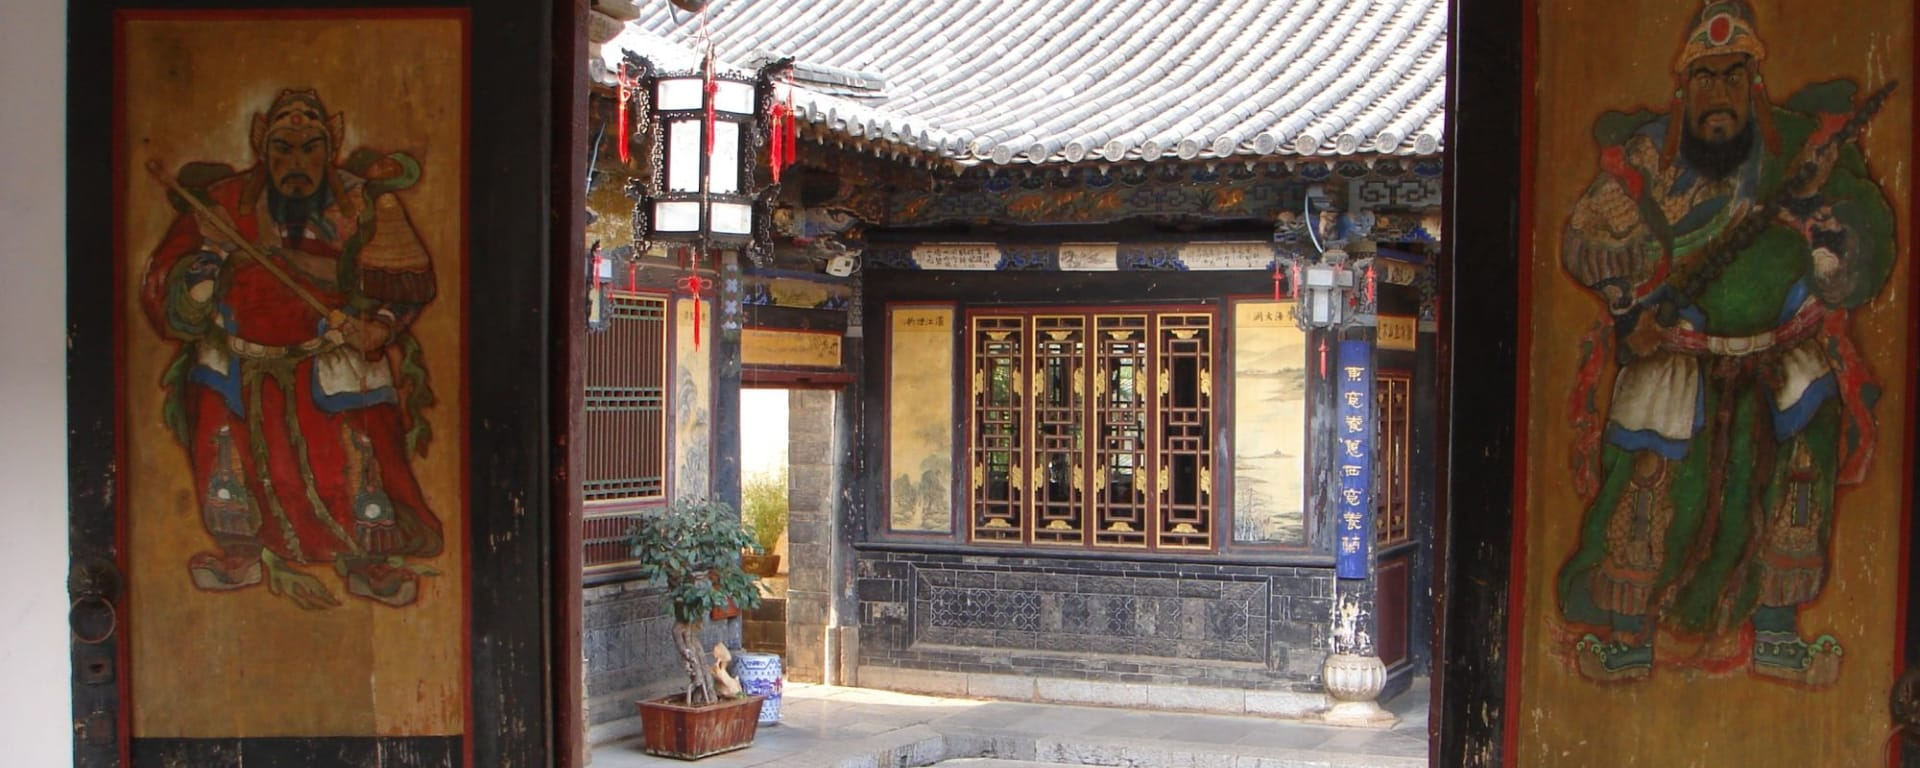 Yunnans unbekannter Süden ab Kunming: Jian Shui: Zhu Family Garden Door